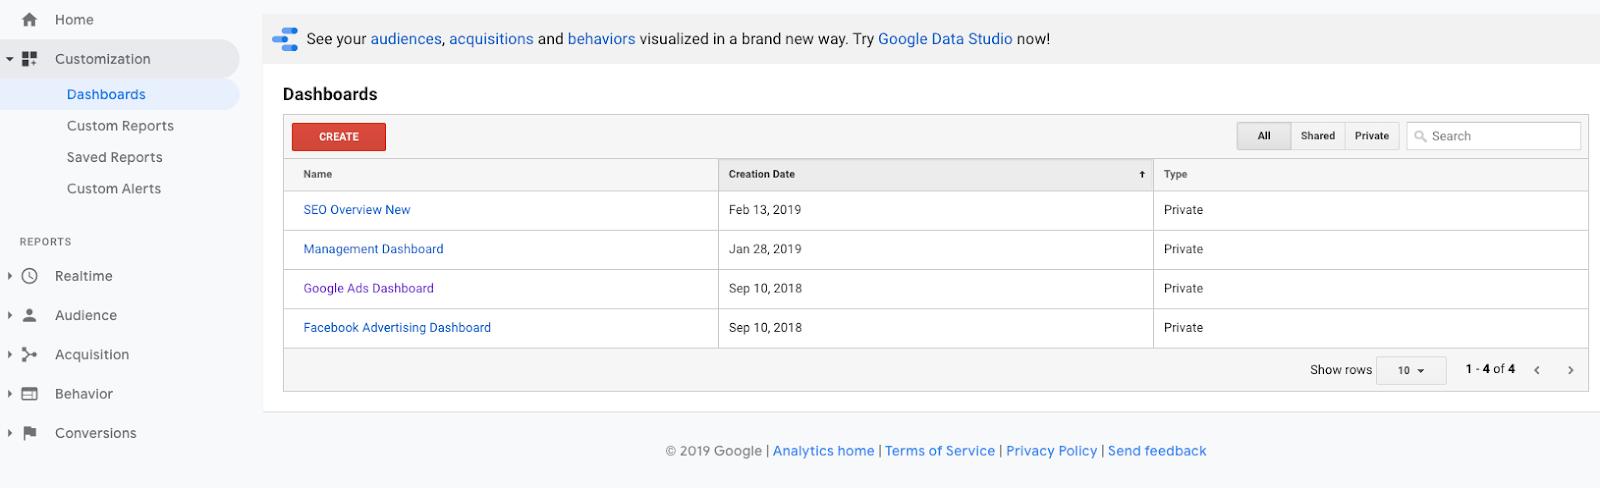 custom dashboards in Google Analytics